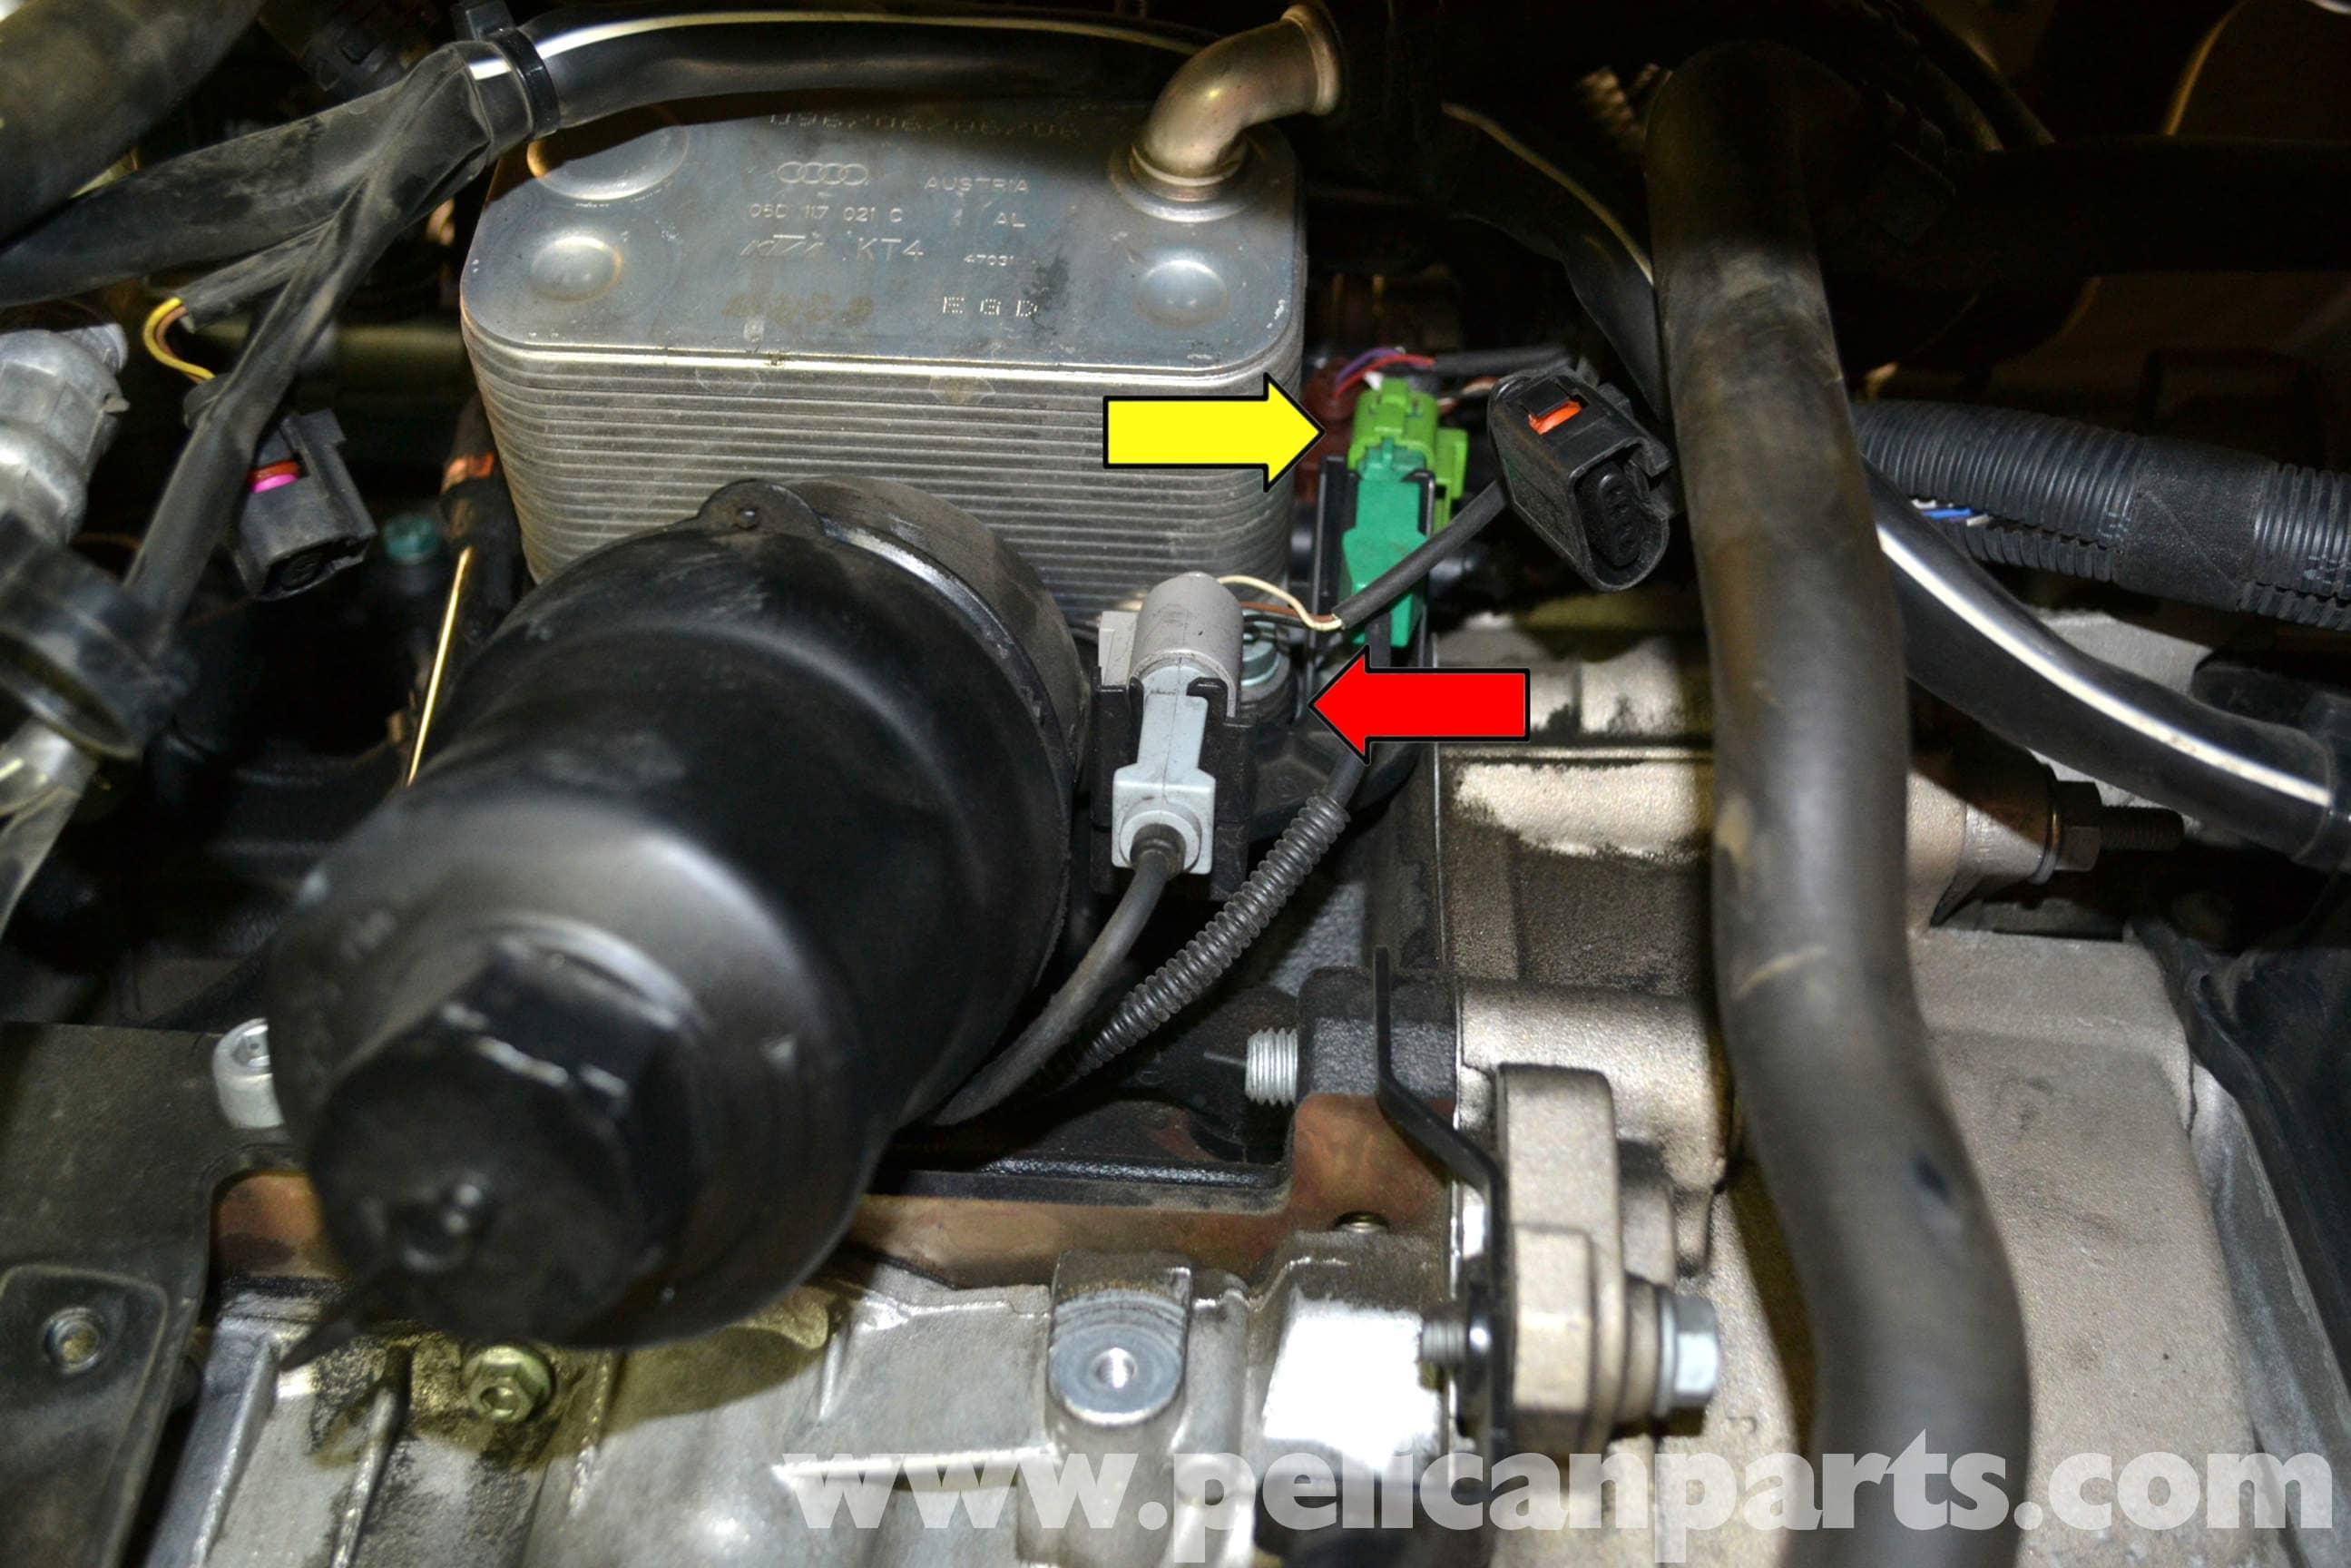 Volkswagen Golf GTI Mk V Knock Sensor Replacement (2006-2009